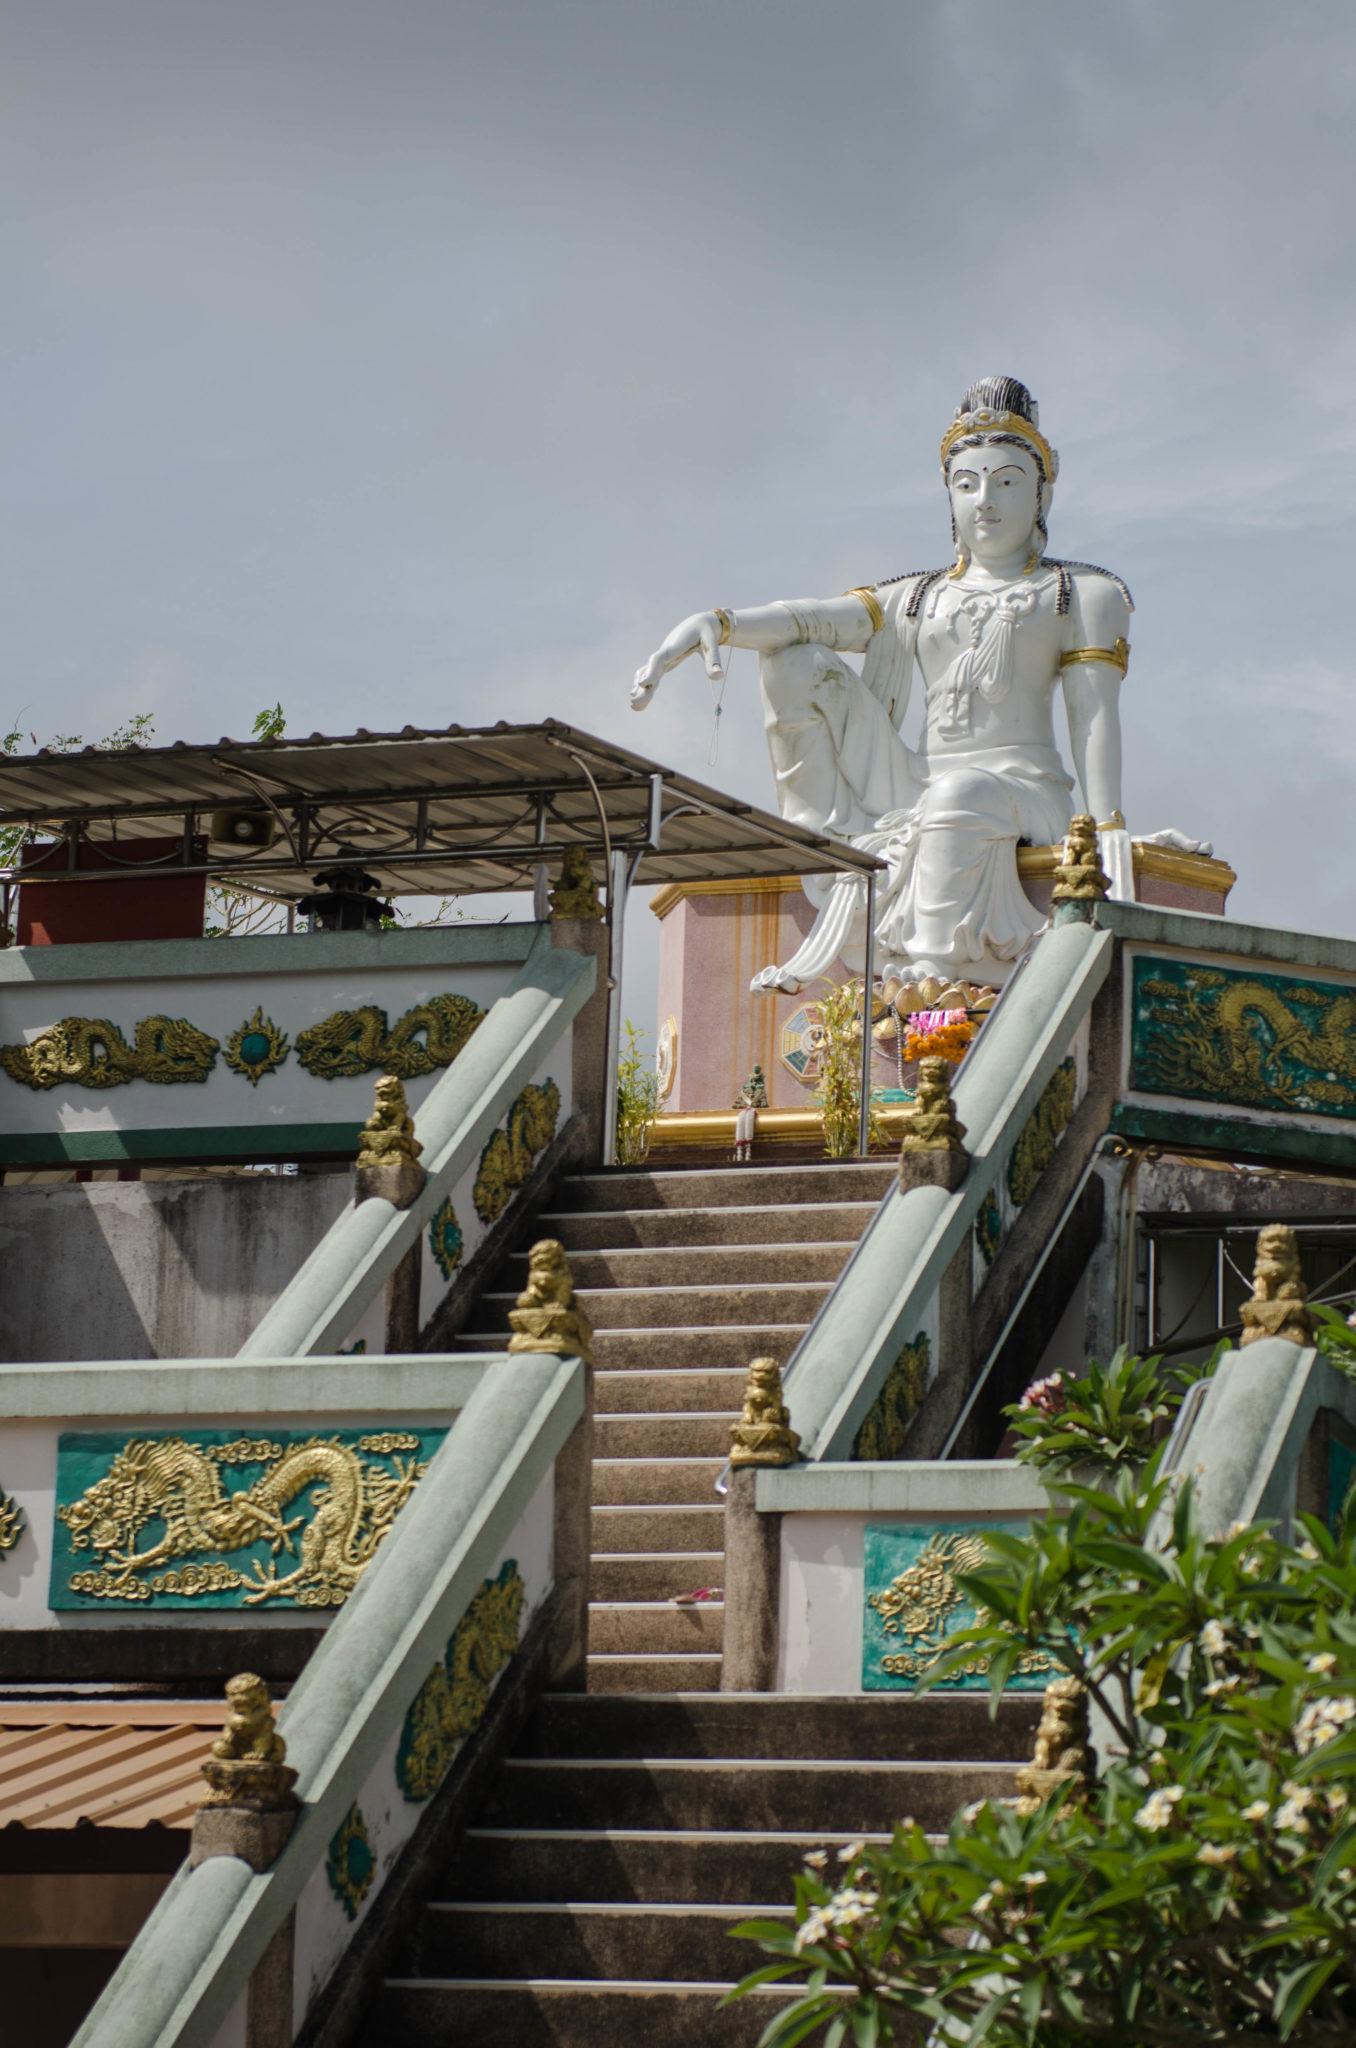 Chumphon Sehenswürdigkeiten: Khao Mat See Viewpoint